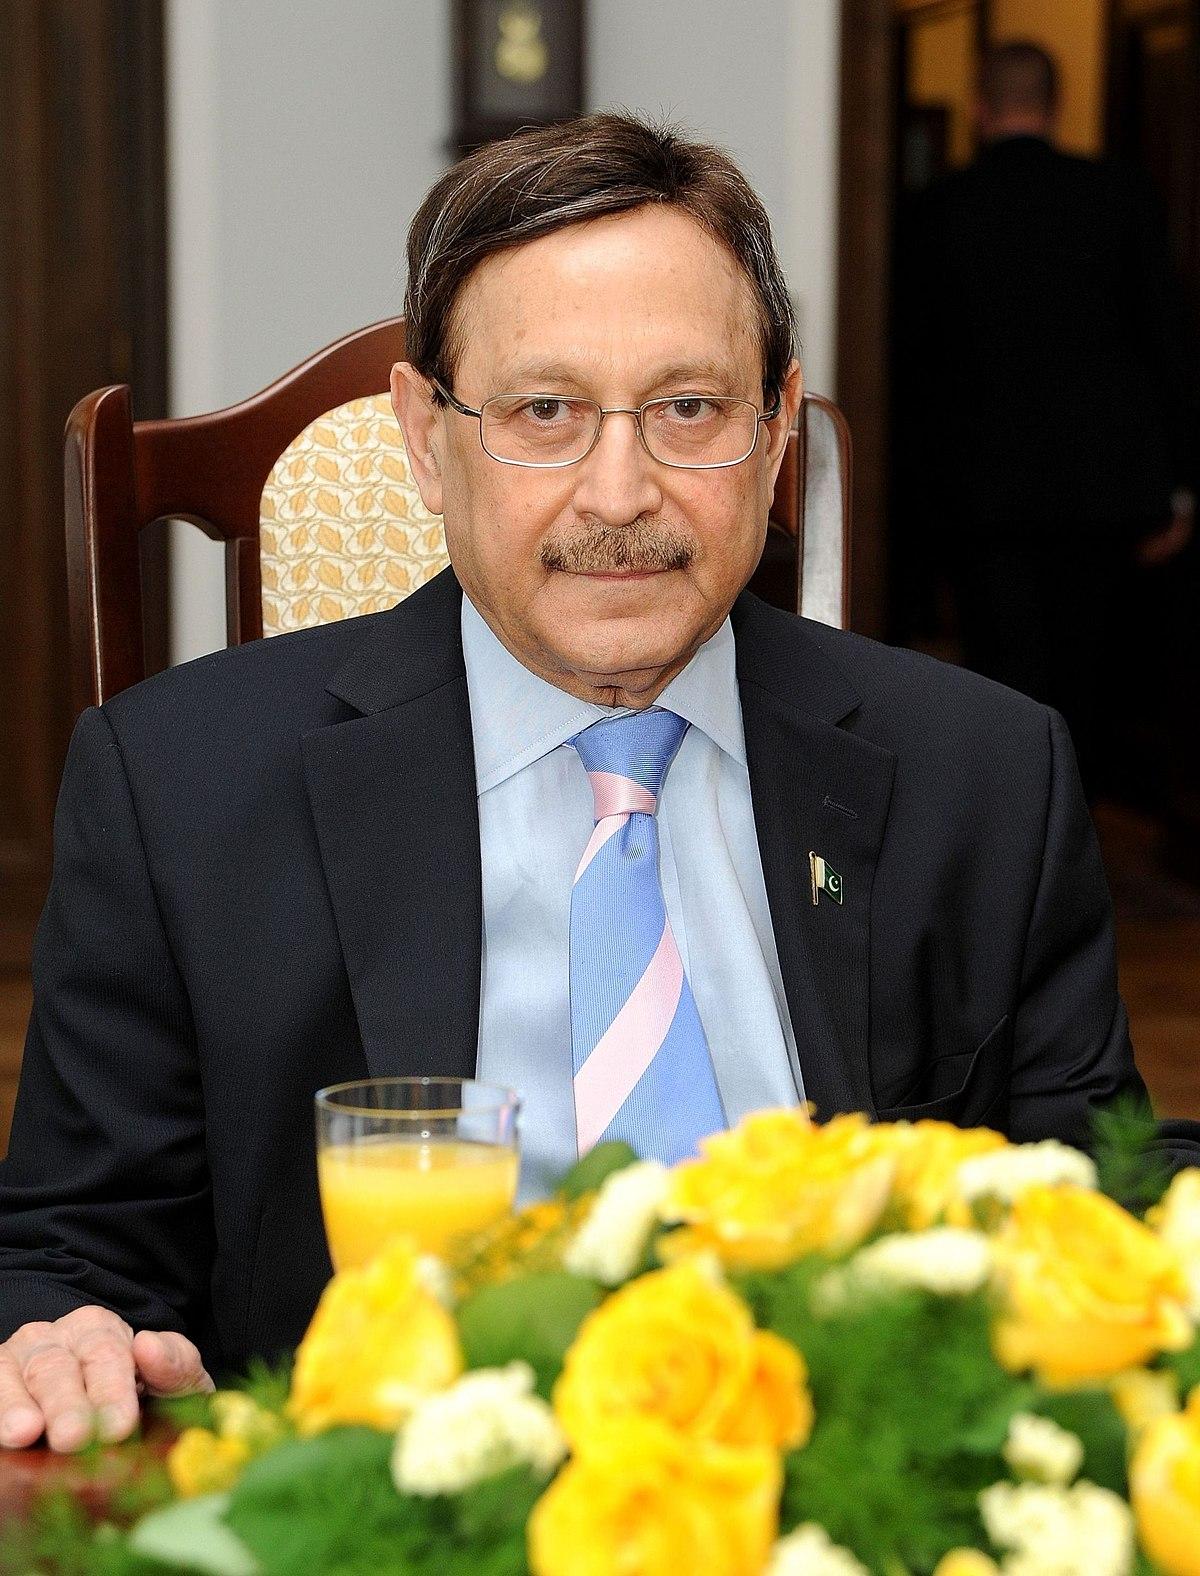 File:Farooq Hamid Naek Senate of Poland.JPG - Wikimedia Commons